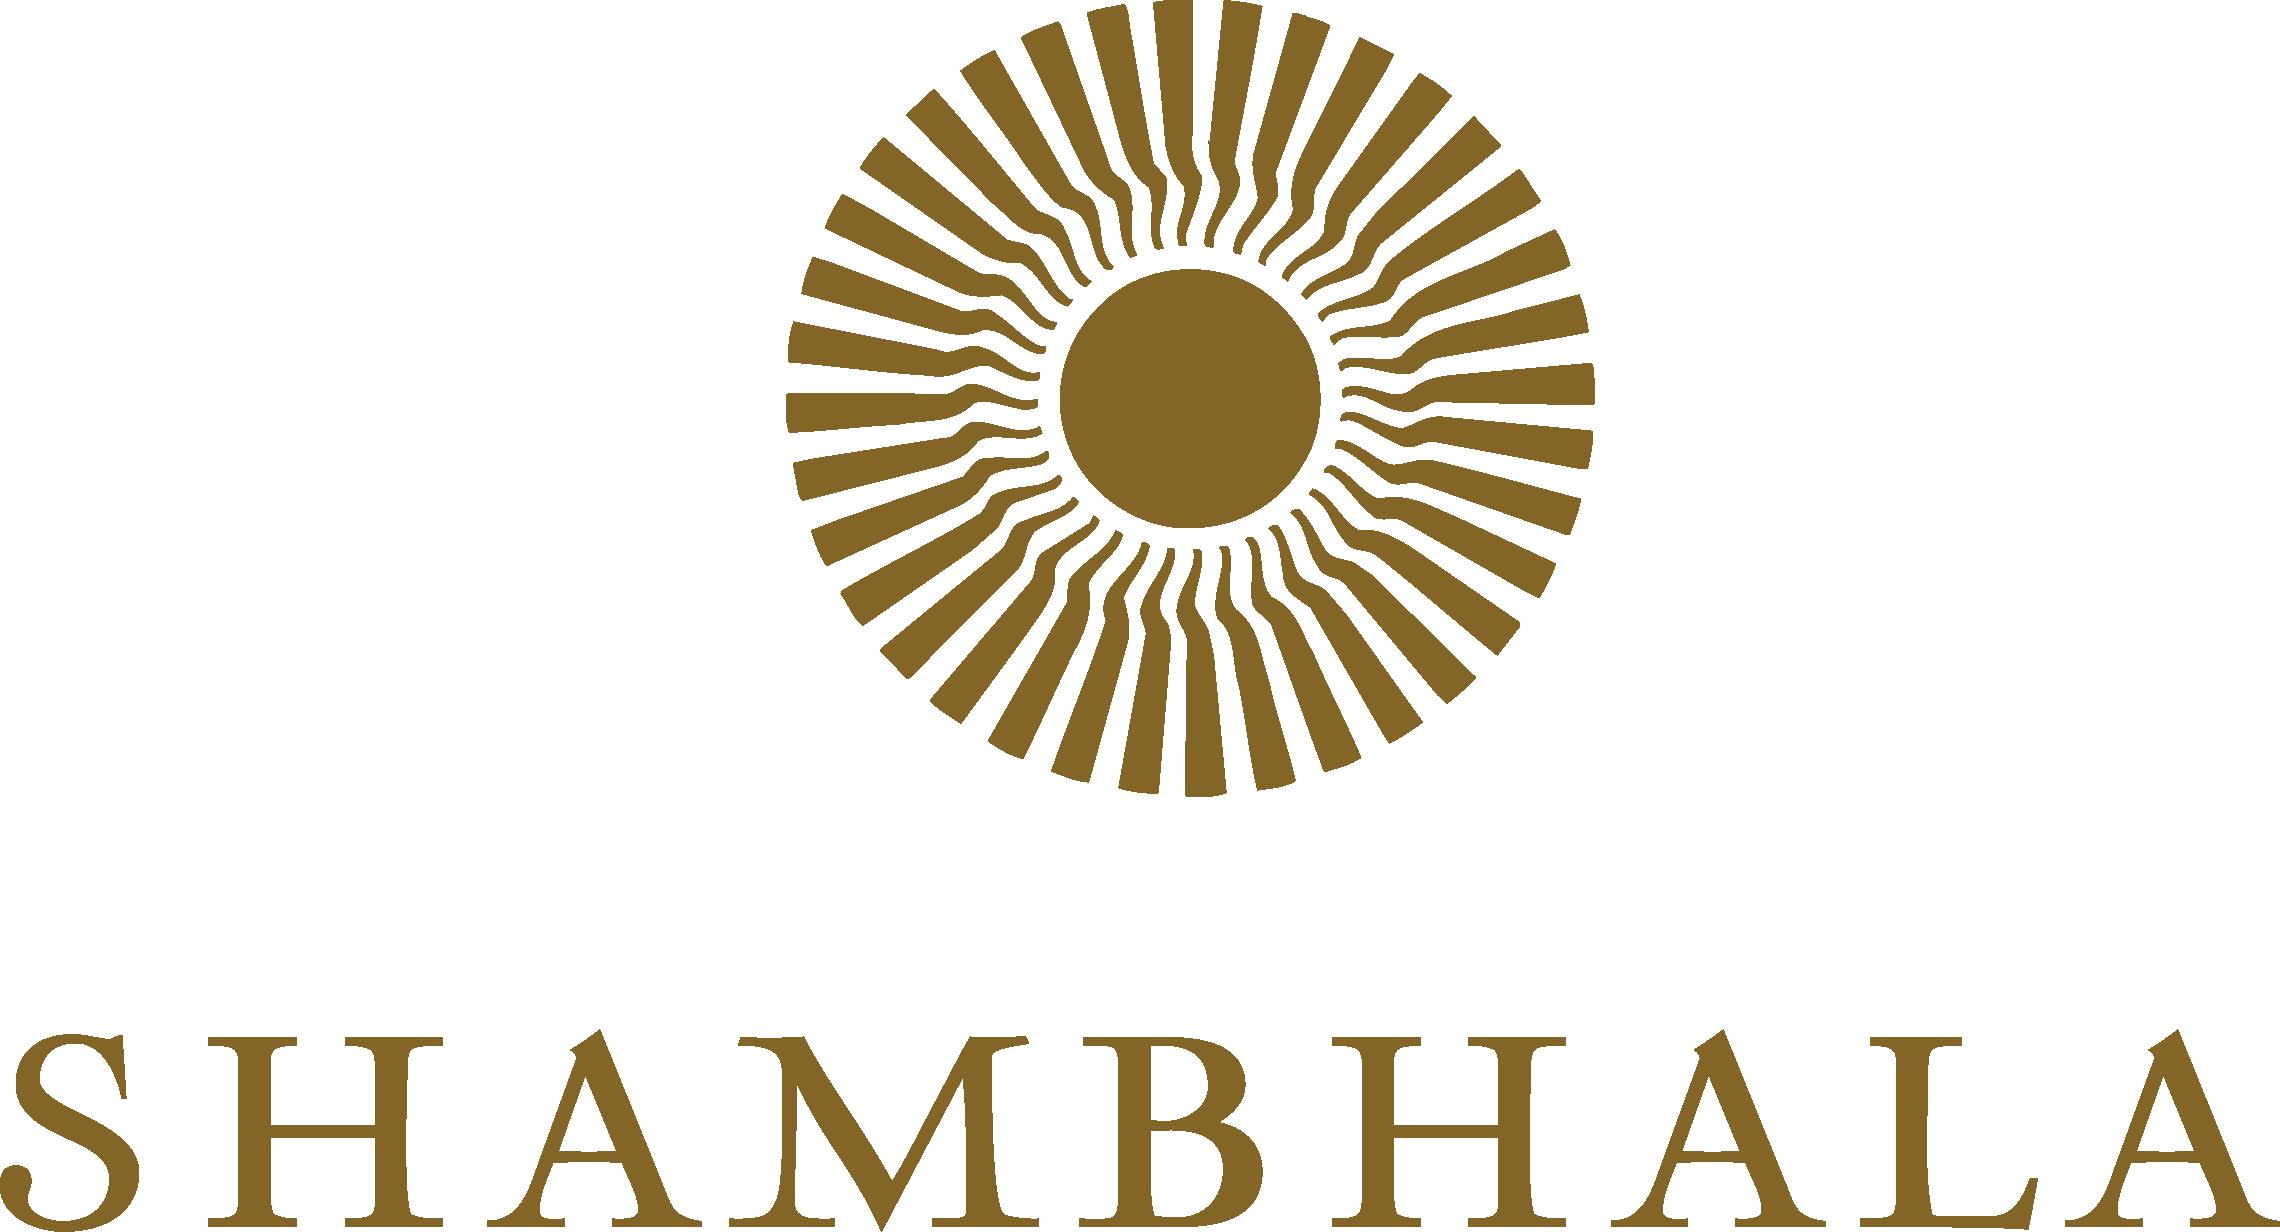 Shambhala google search the sacred path of the warrior shambhala google search buycottarizona Images